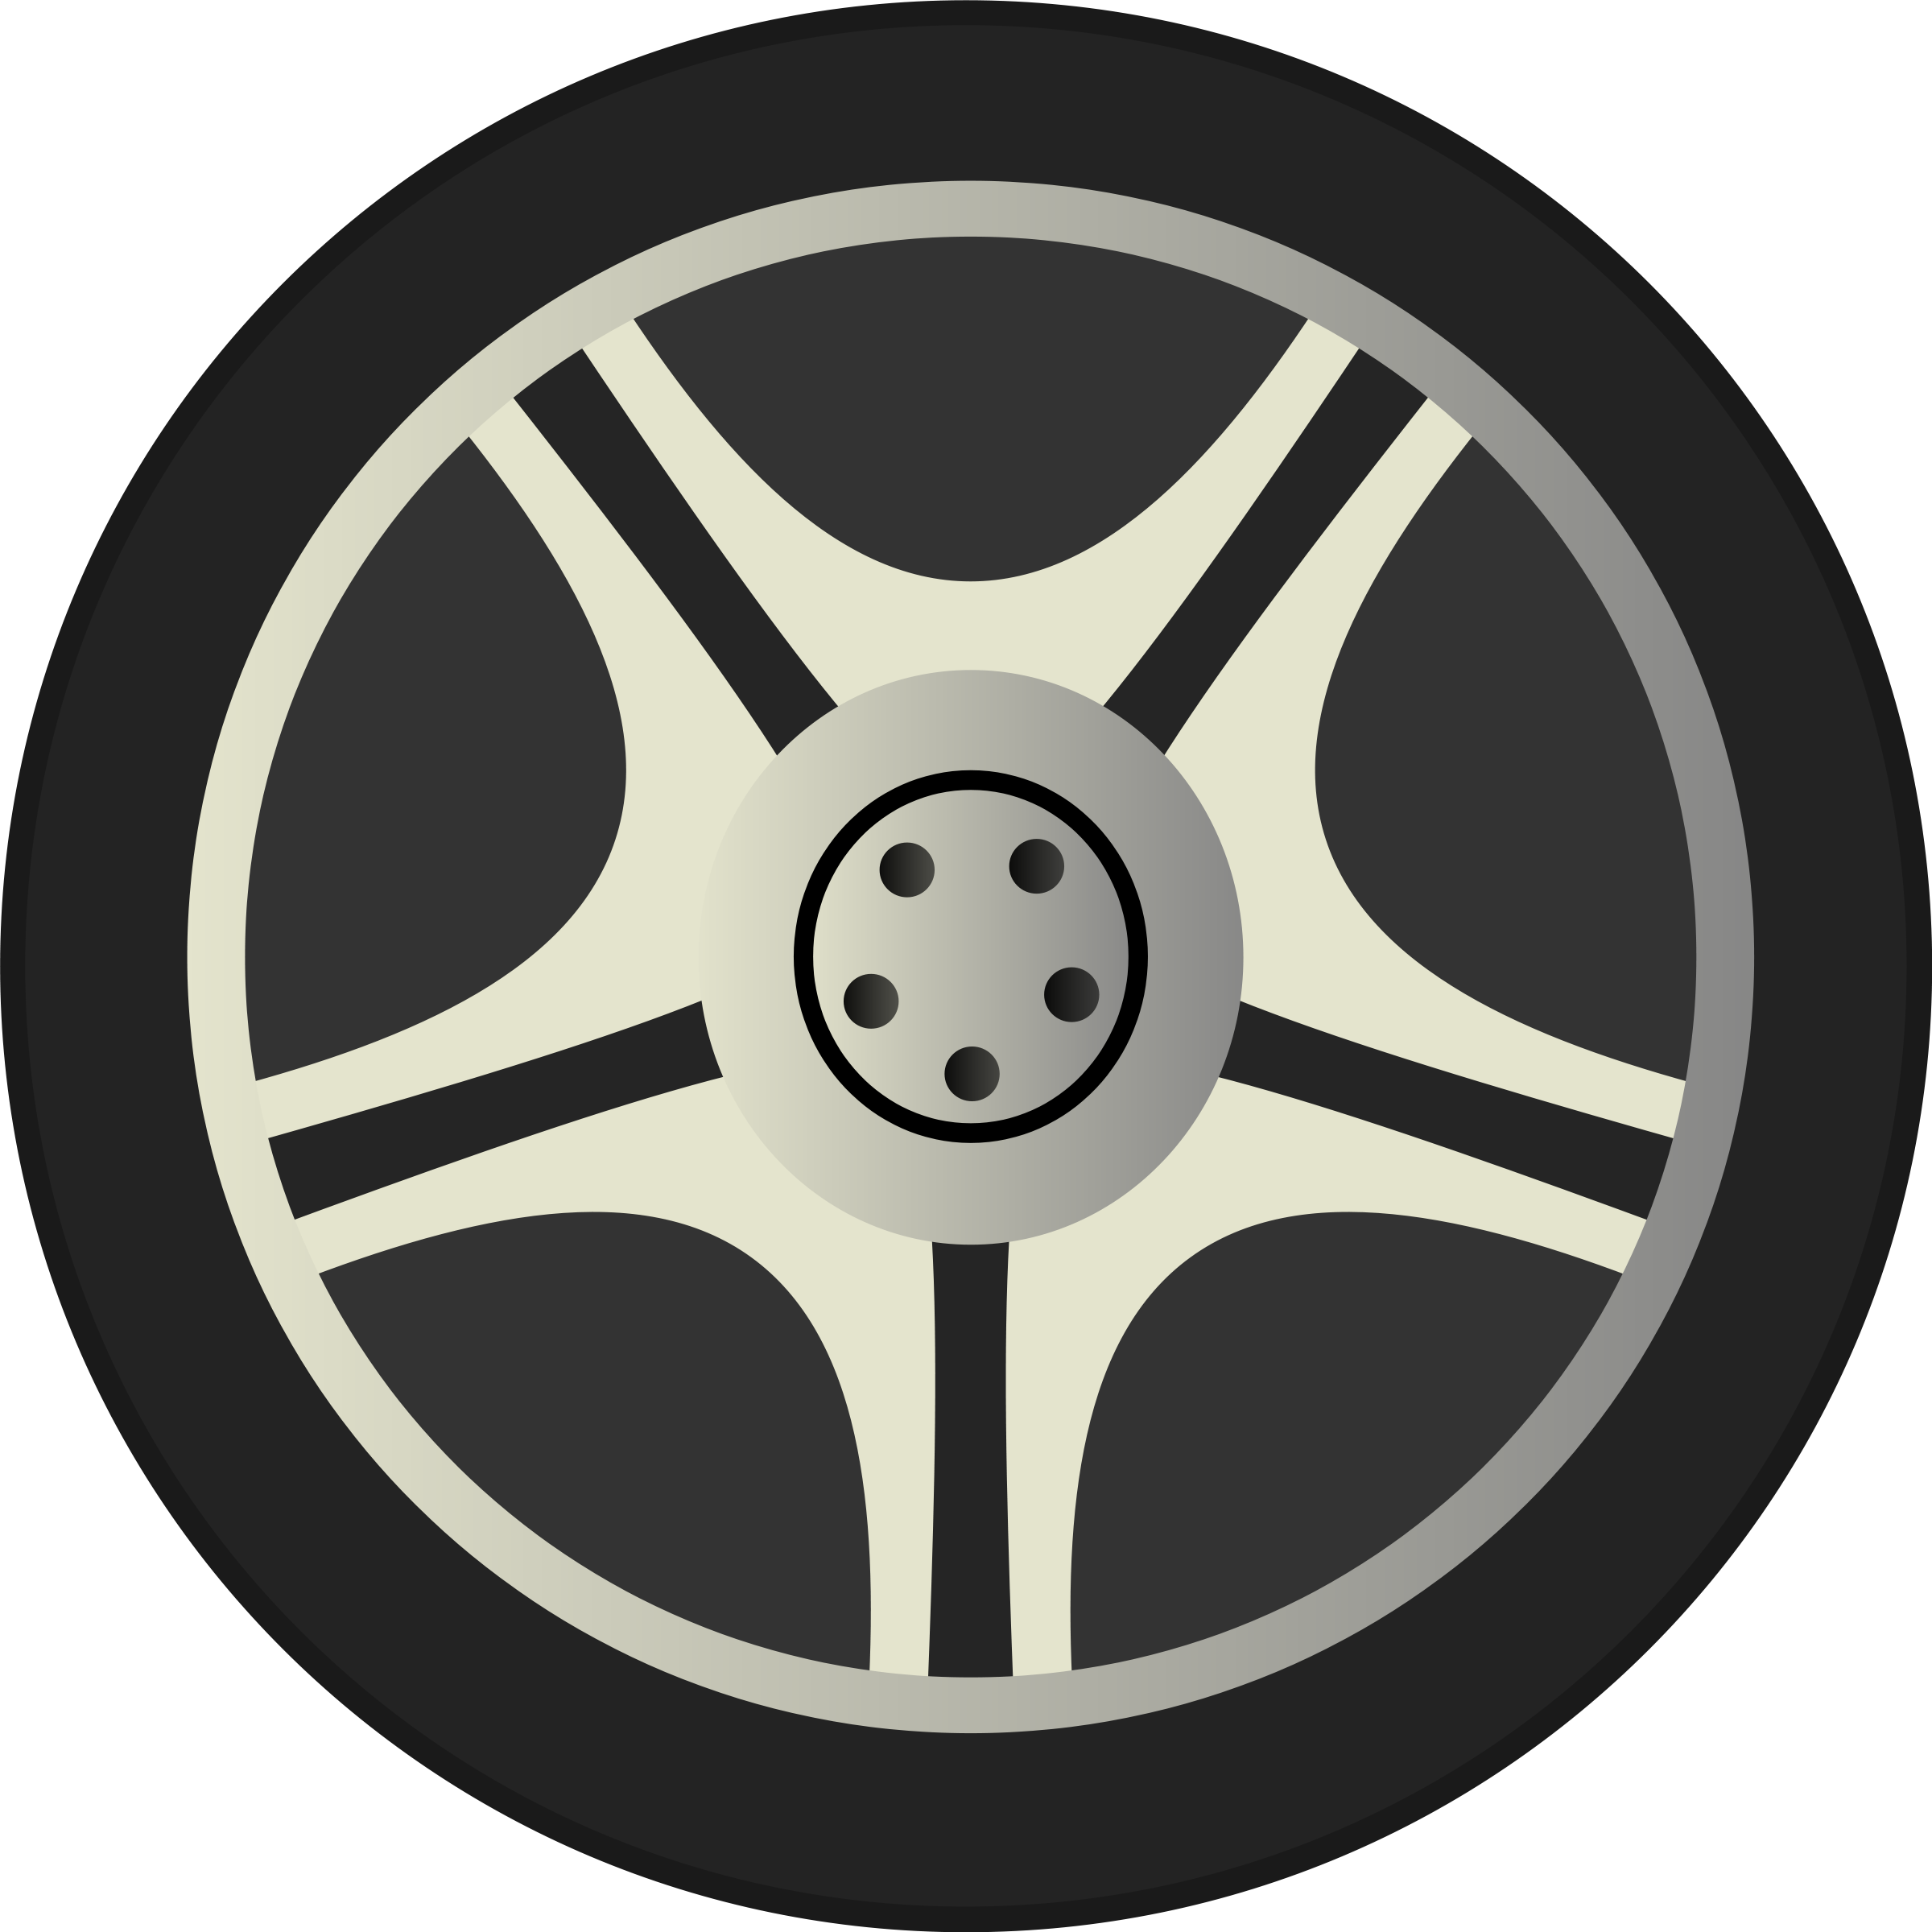 Car Wheel Dhama Wheel Clipart Vector Clip Art.